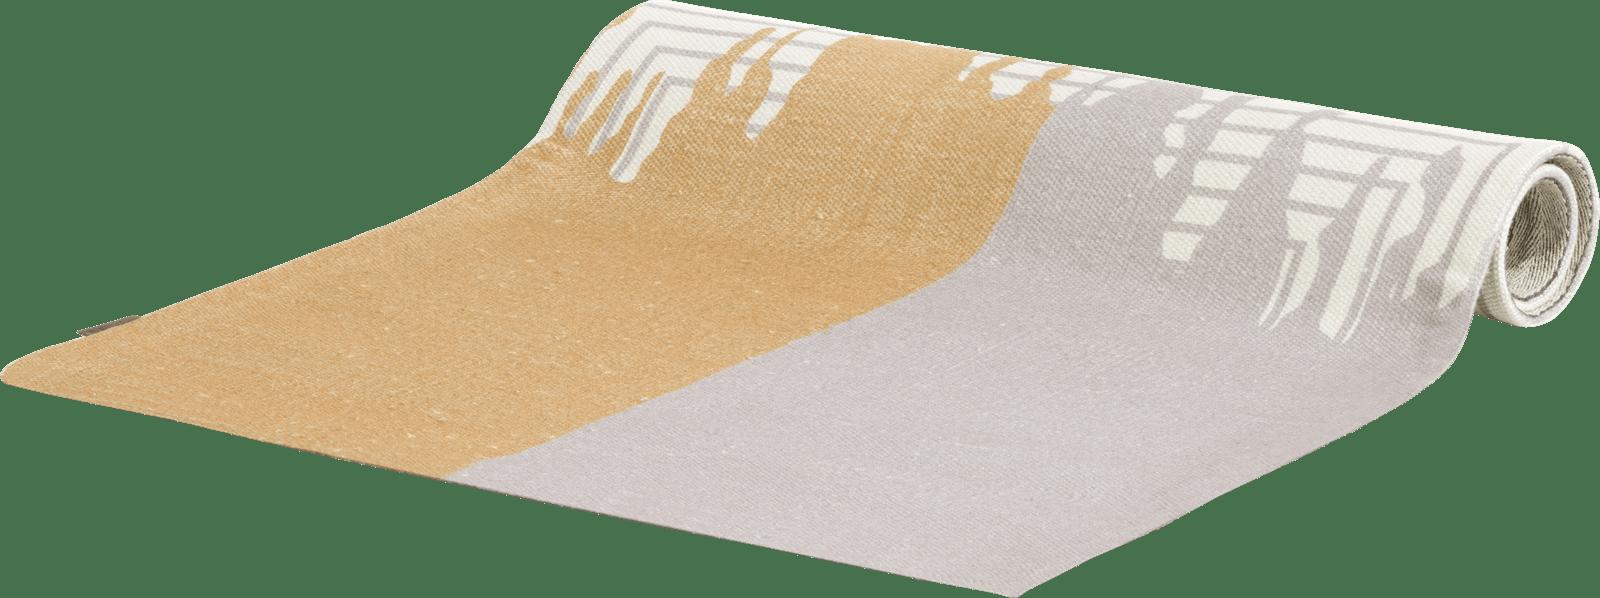 XOOON - Coco Maison - drip rug 90x150cm